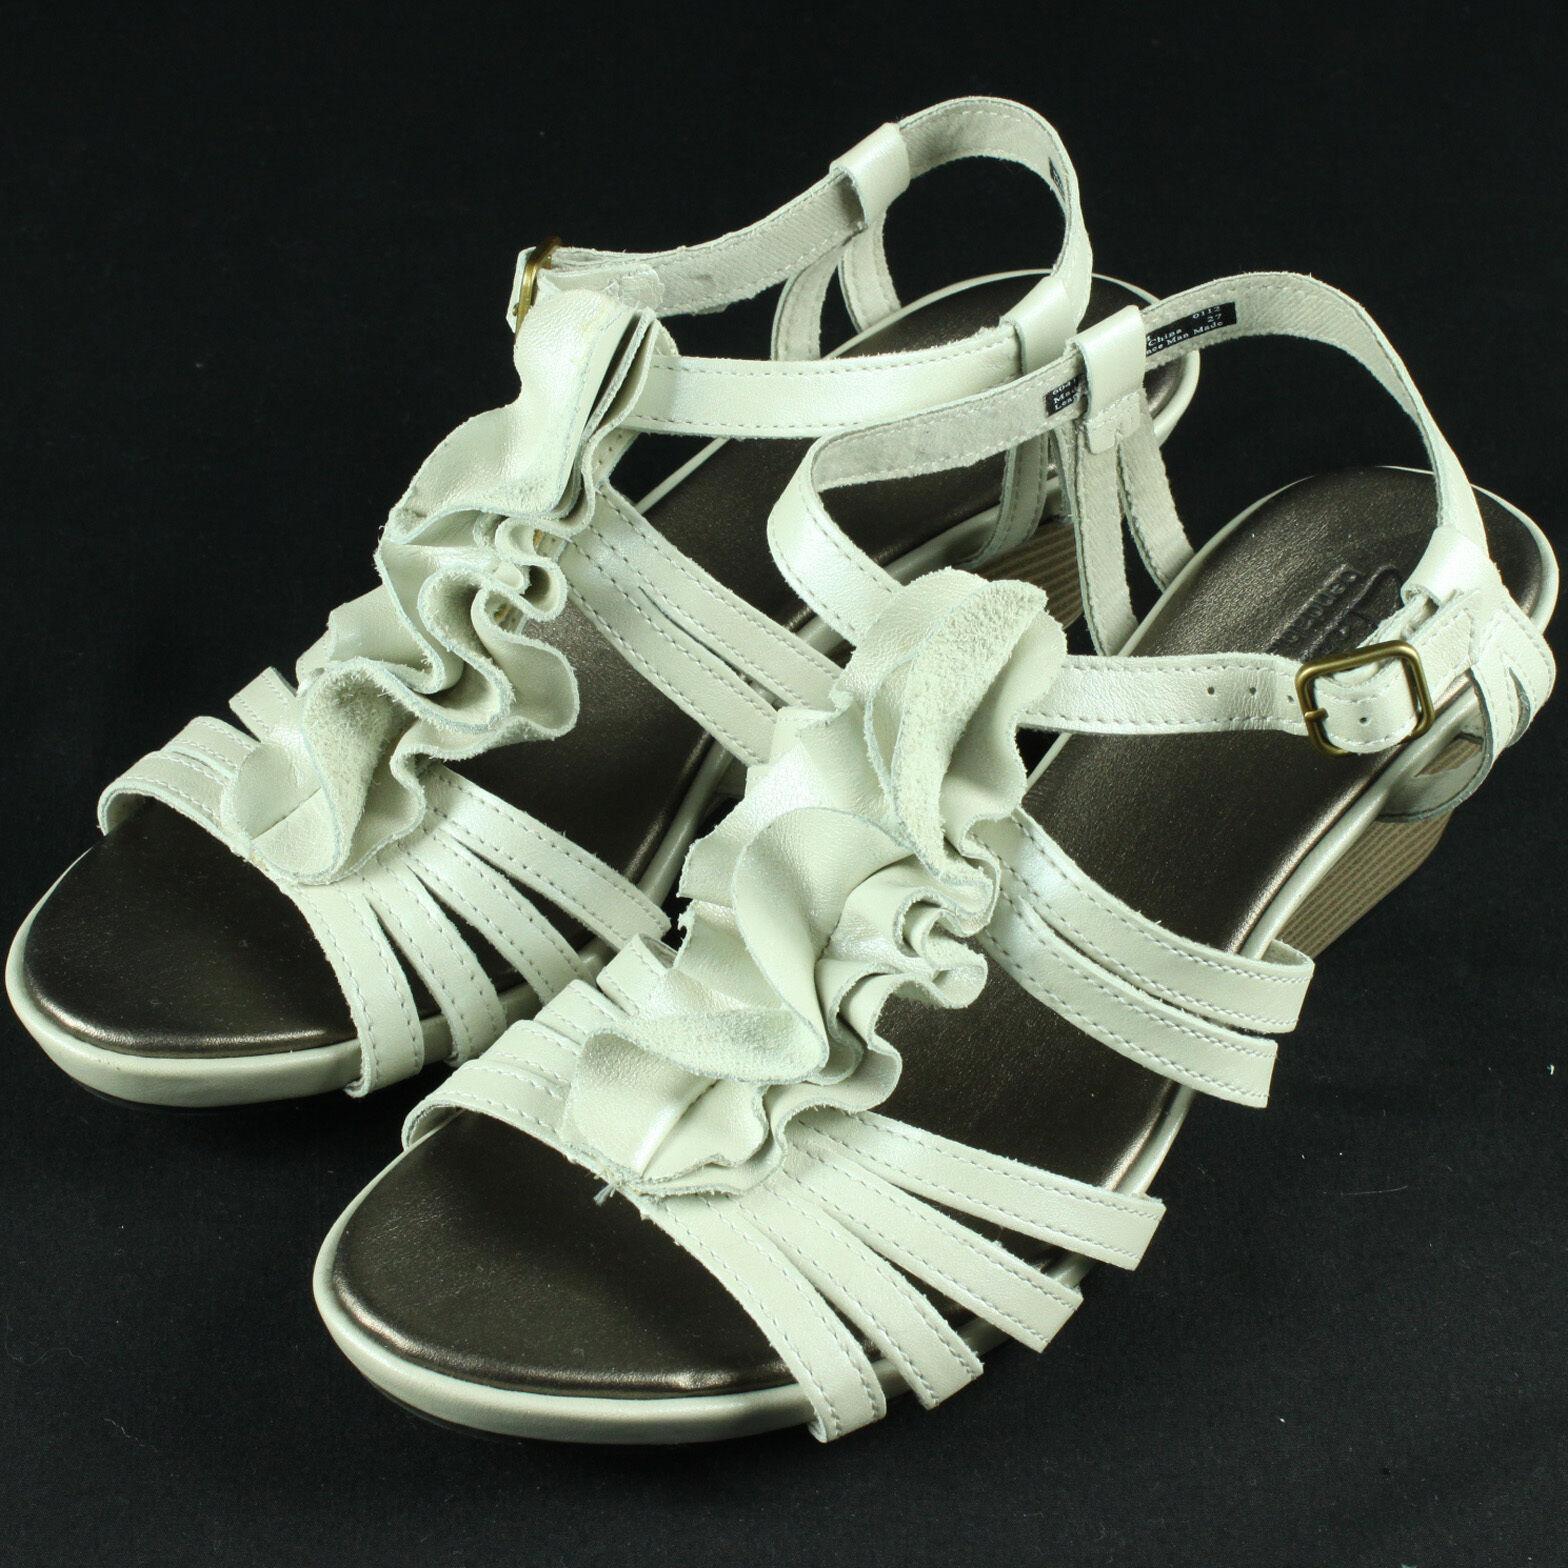 Clarks Lucia Resort Wedge Sandals 10 Heels chaussures Comfortable 10M 2 Inch Sandles